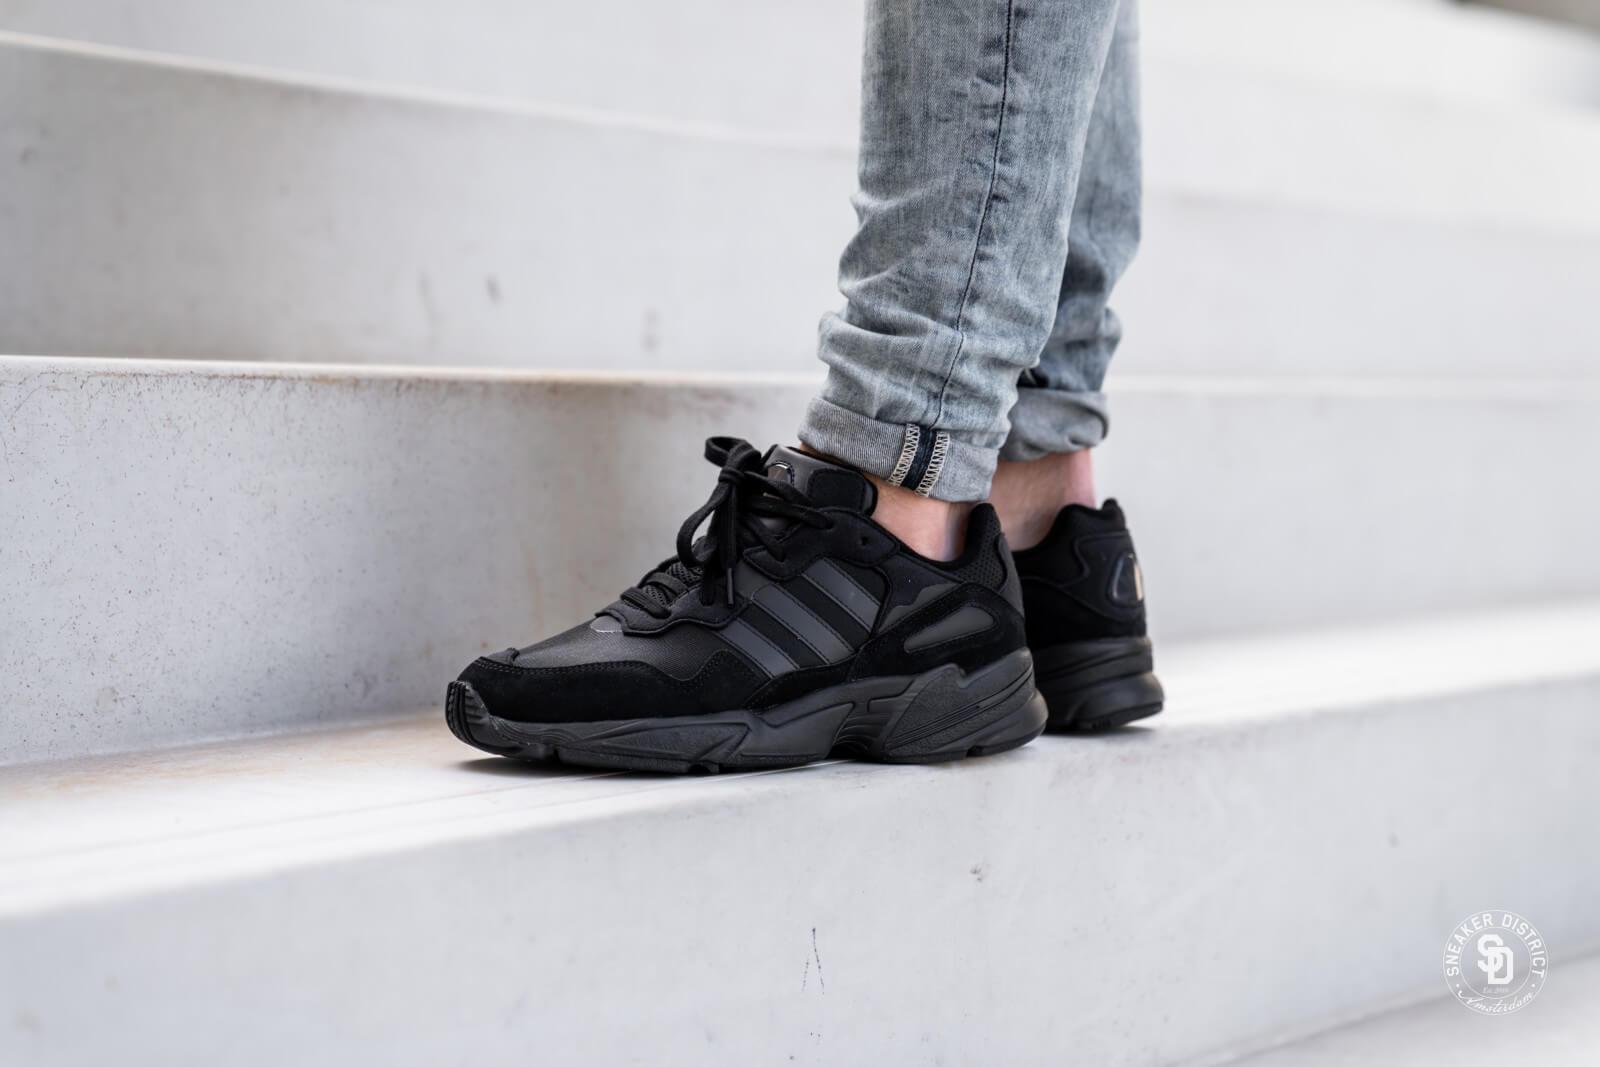 Adidas Yung-96 Core Black/Core Black